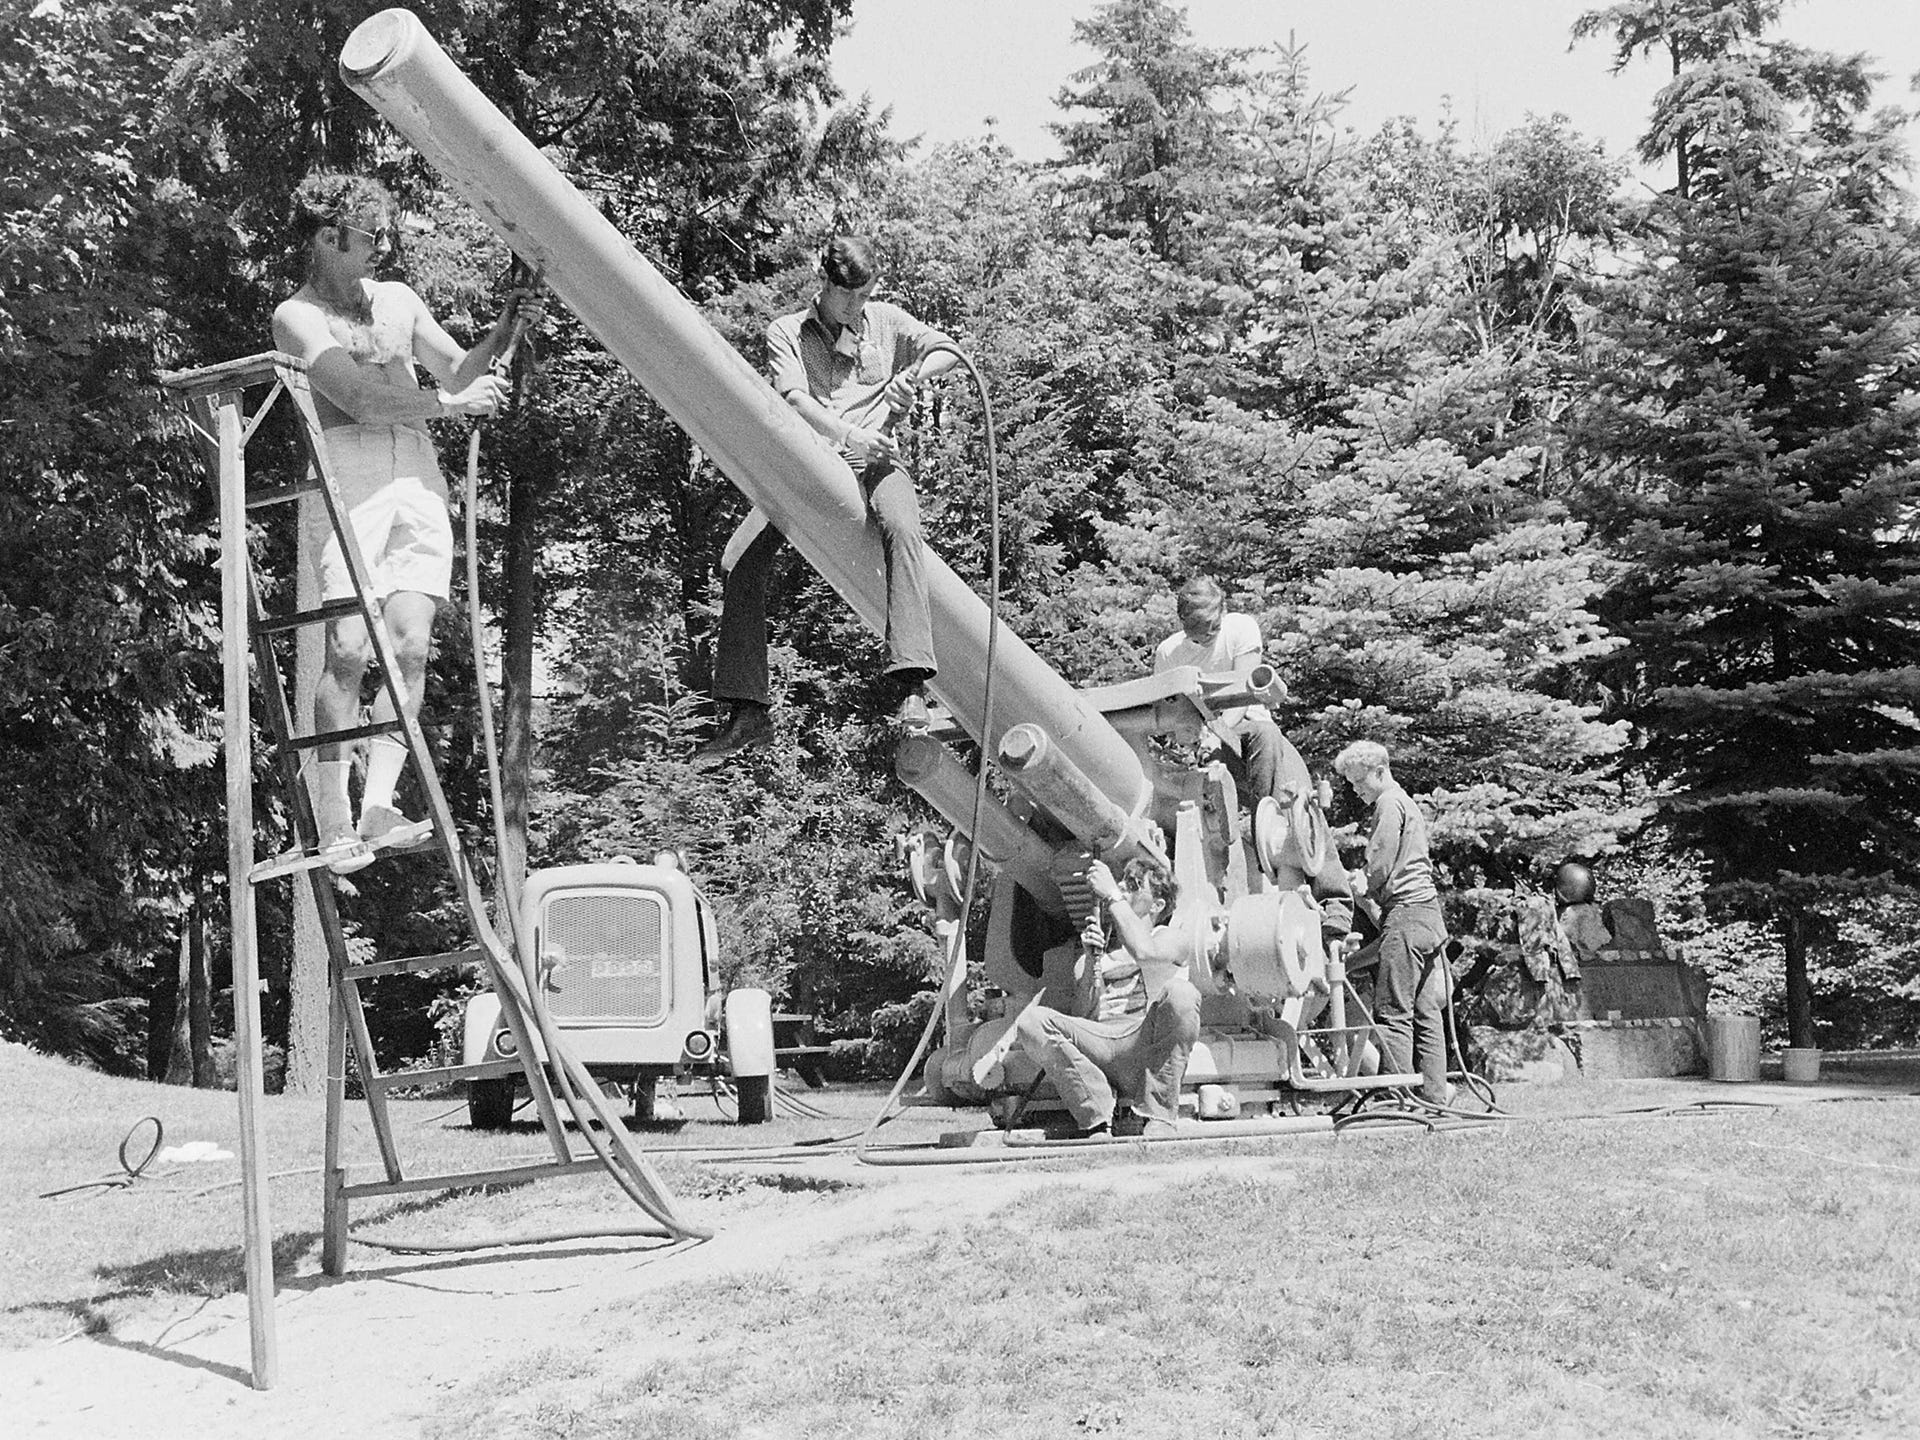 08/04/73Berkley Sailors Painting Gun At Illahee